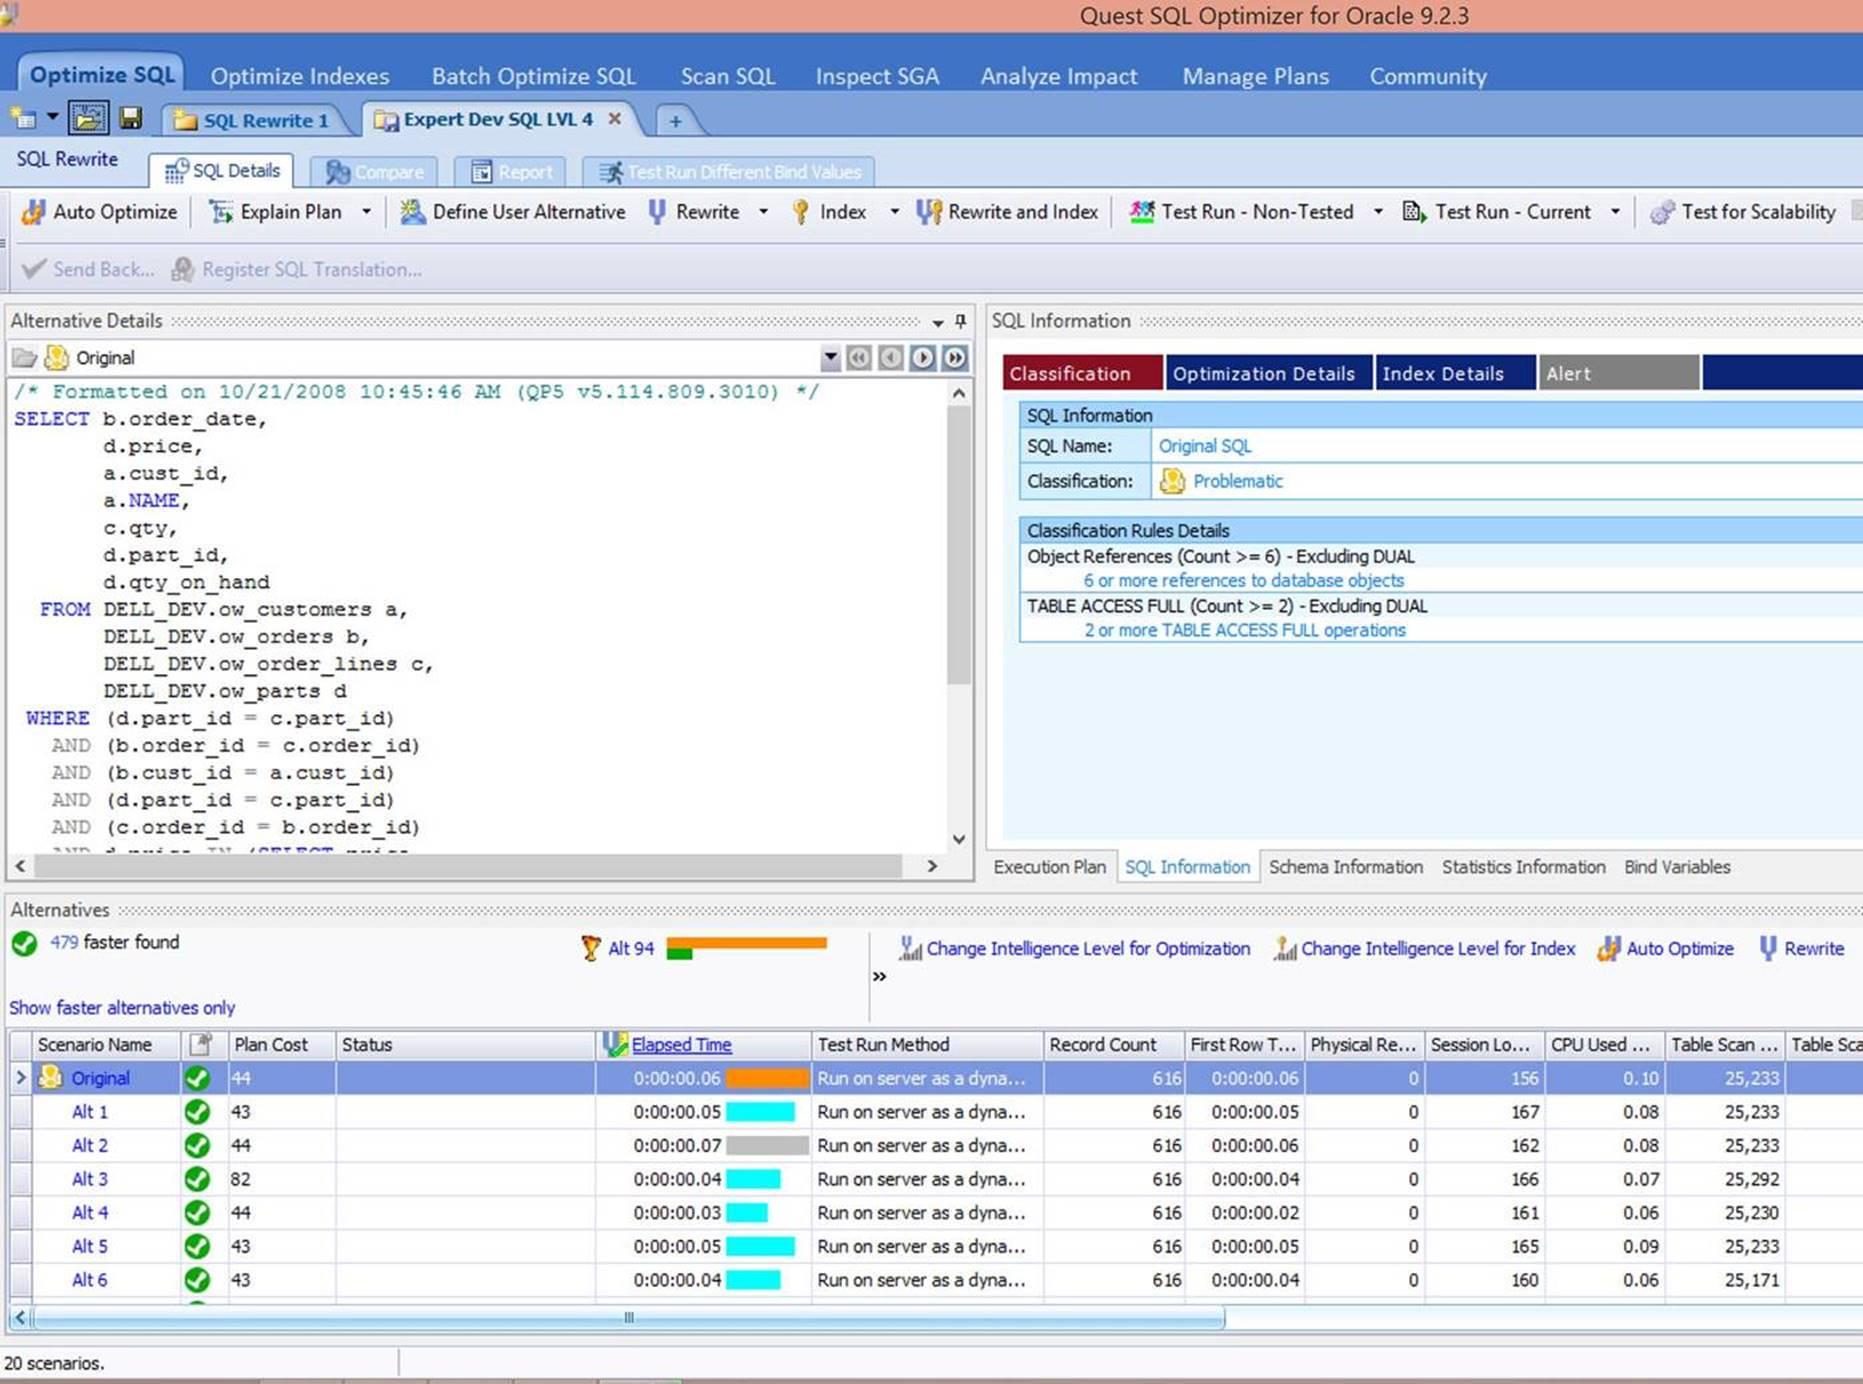 Screen shot : After SQL Optimizer has been run.